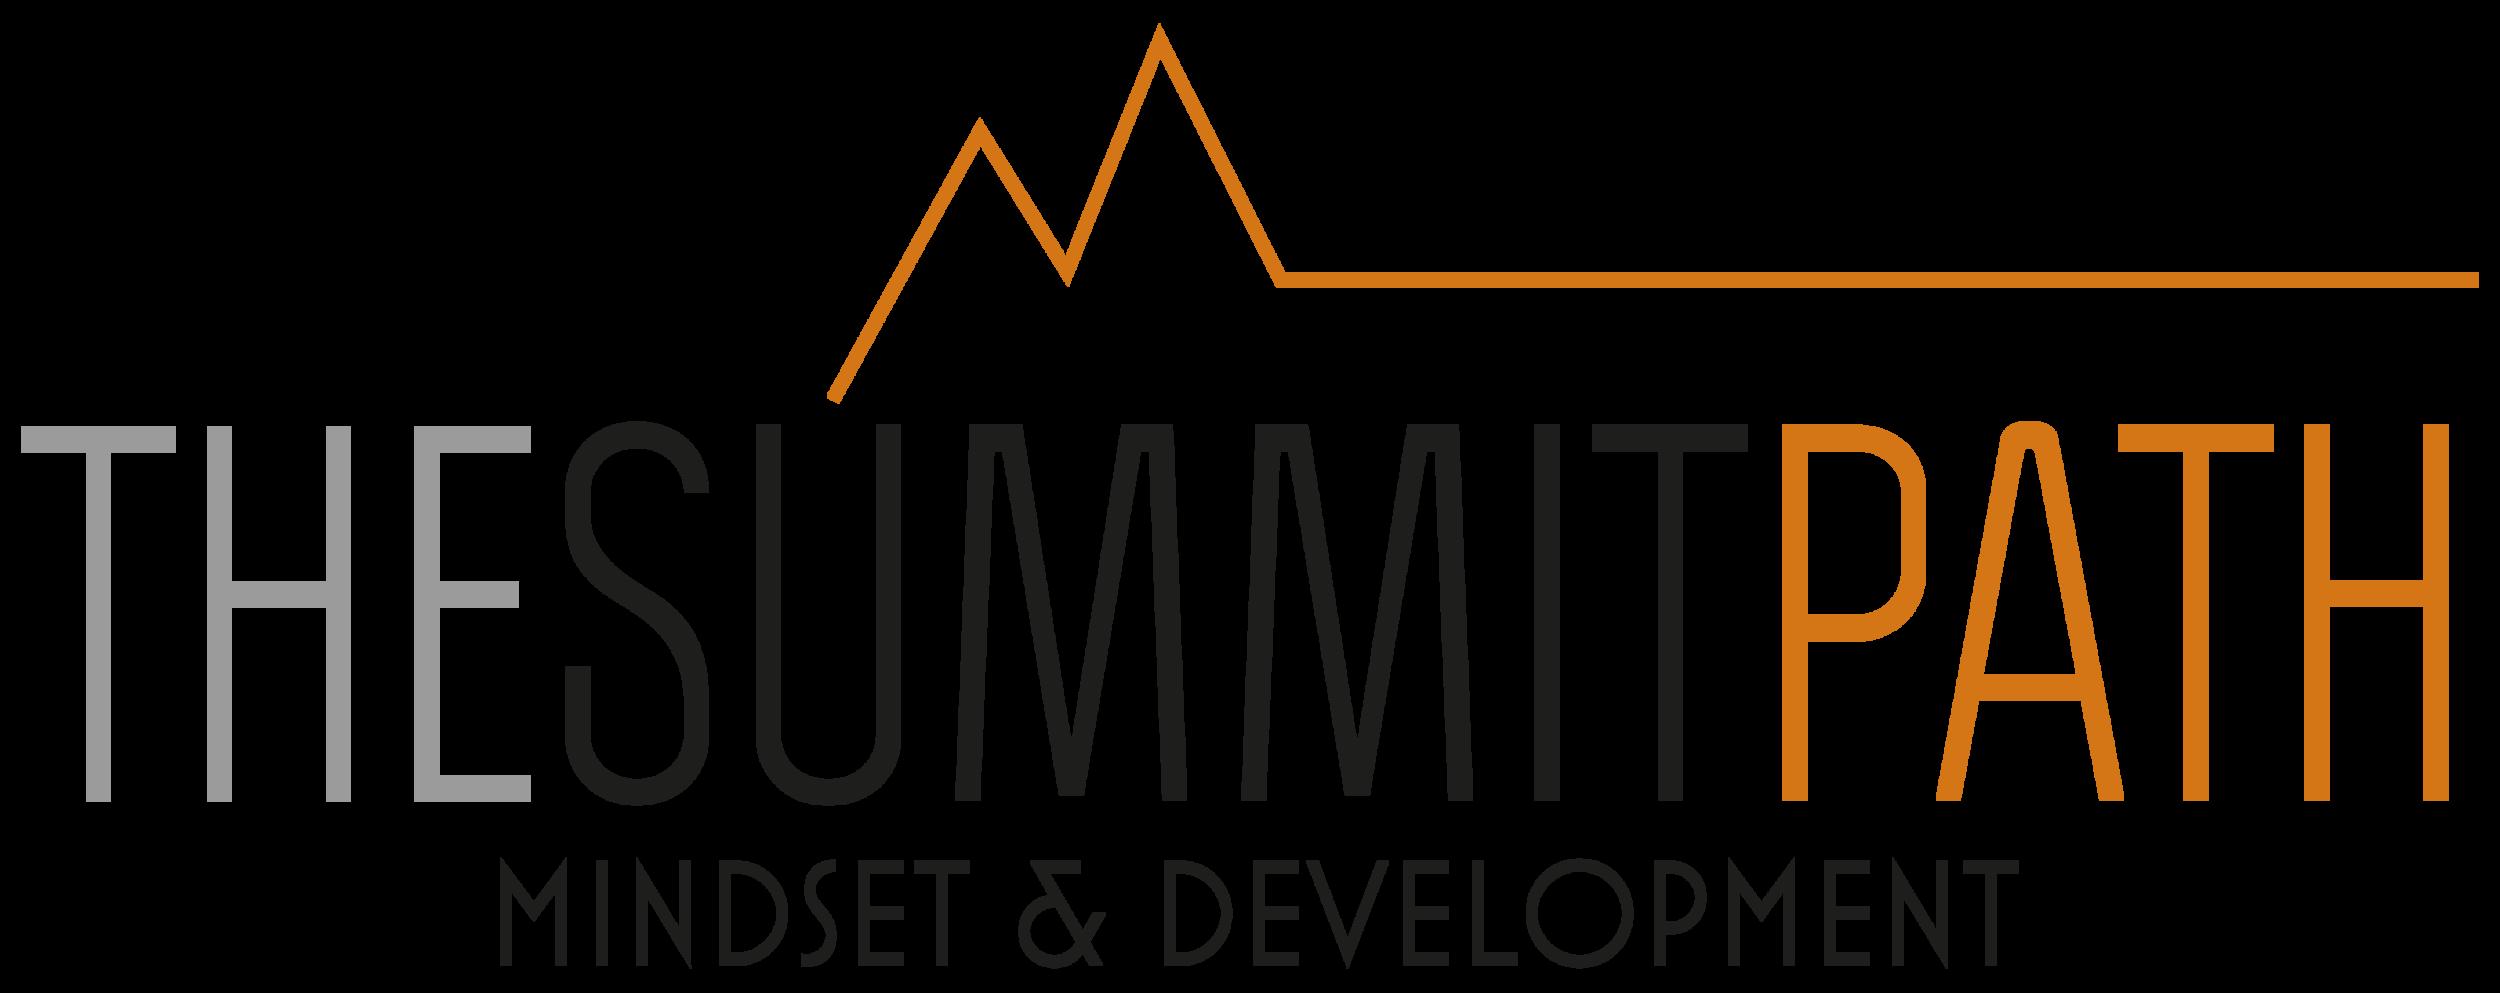 TheSummitPath_Logo-Mindset&Develop.jpeg